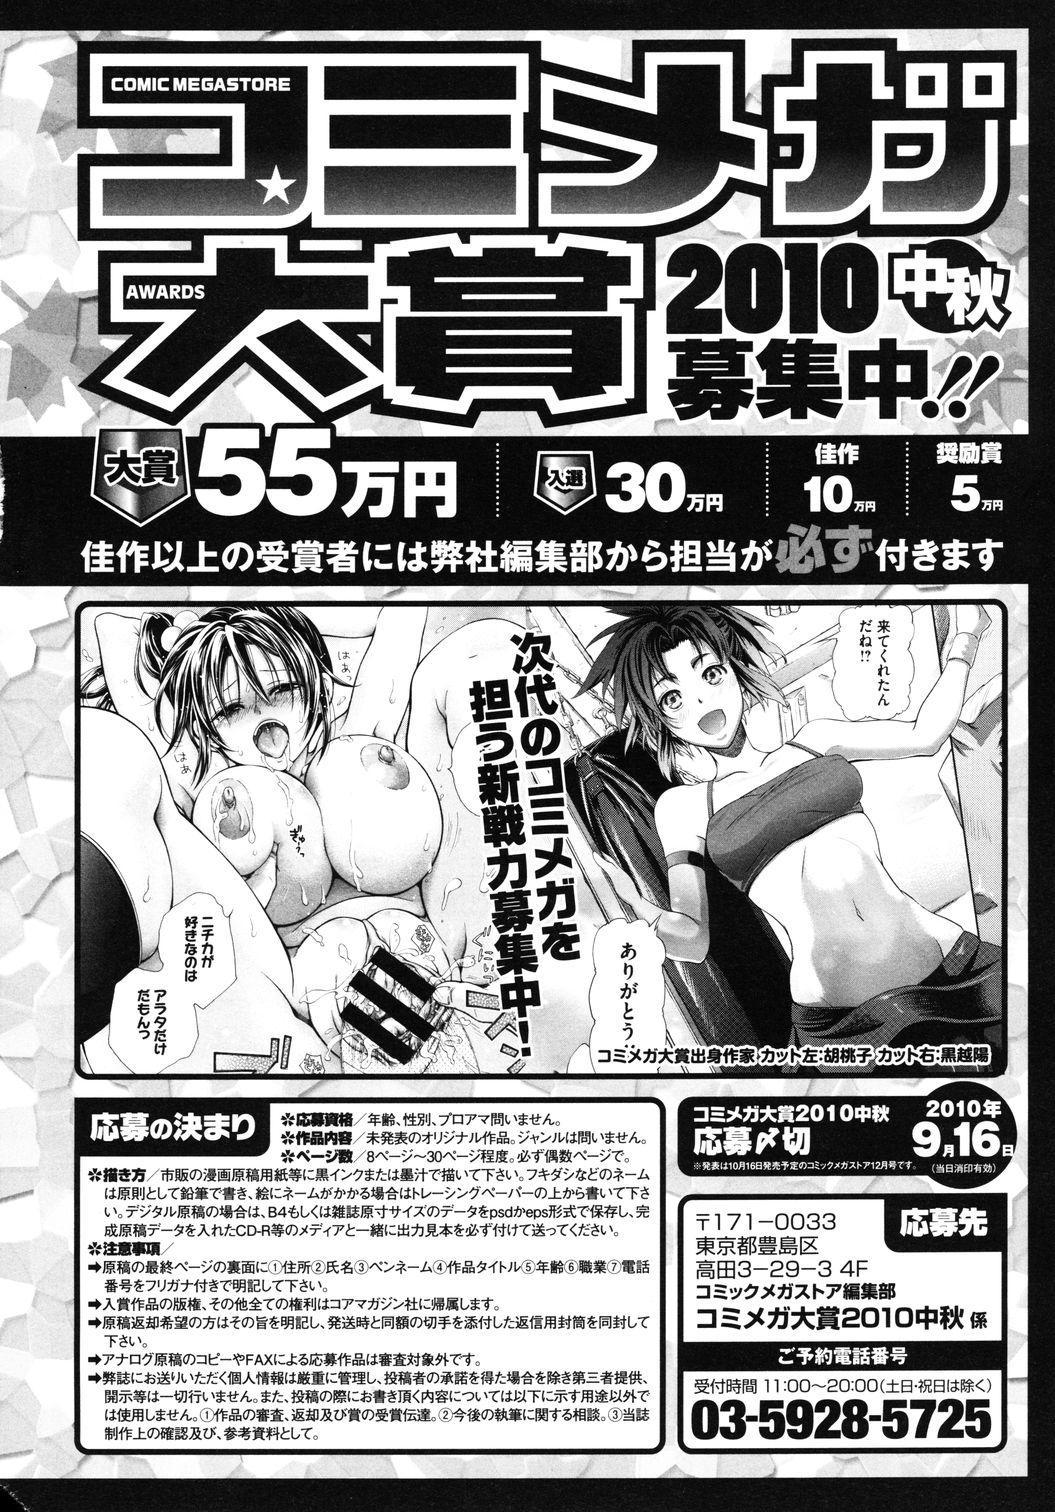 COMIC Megastore 2010-10 506